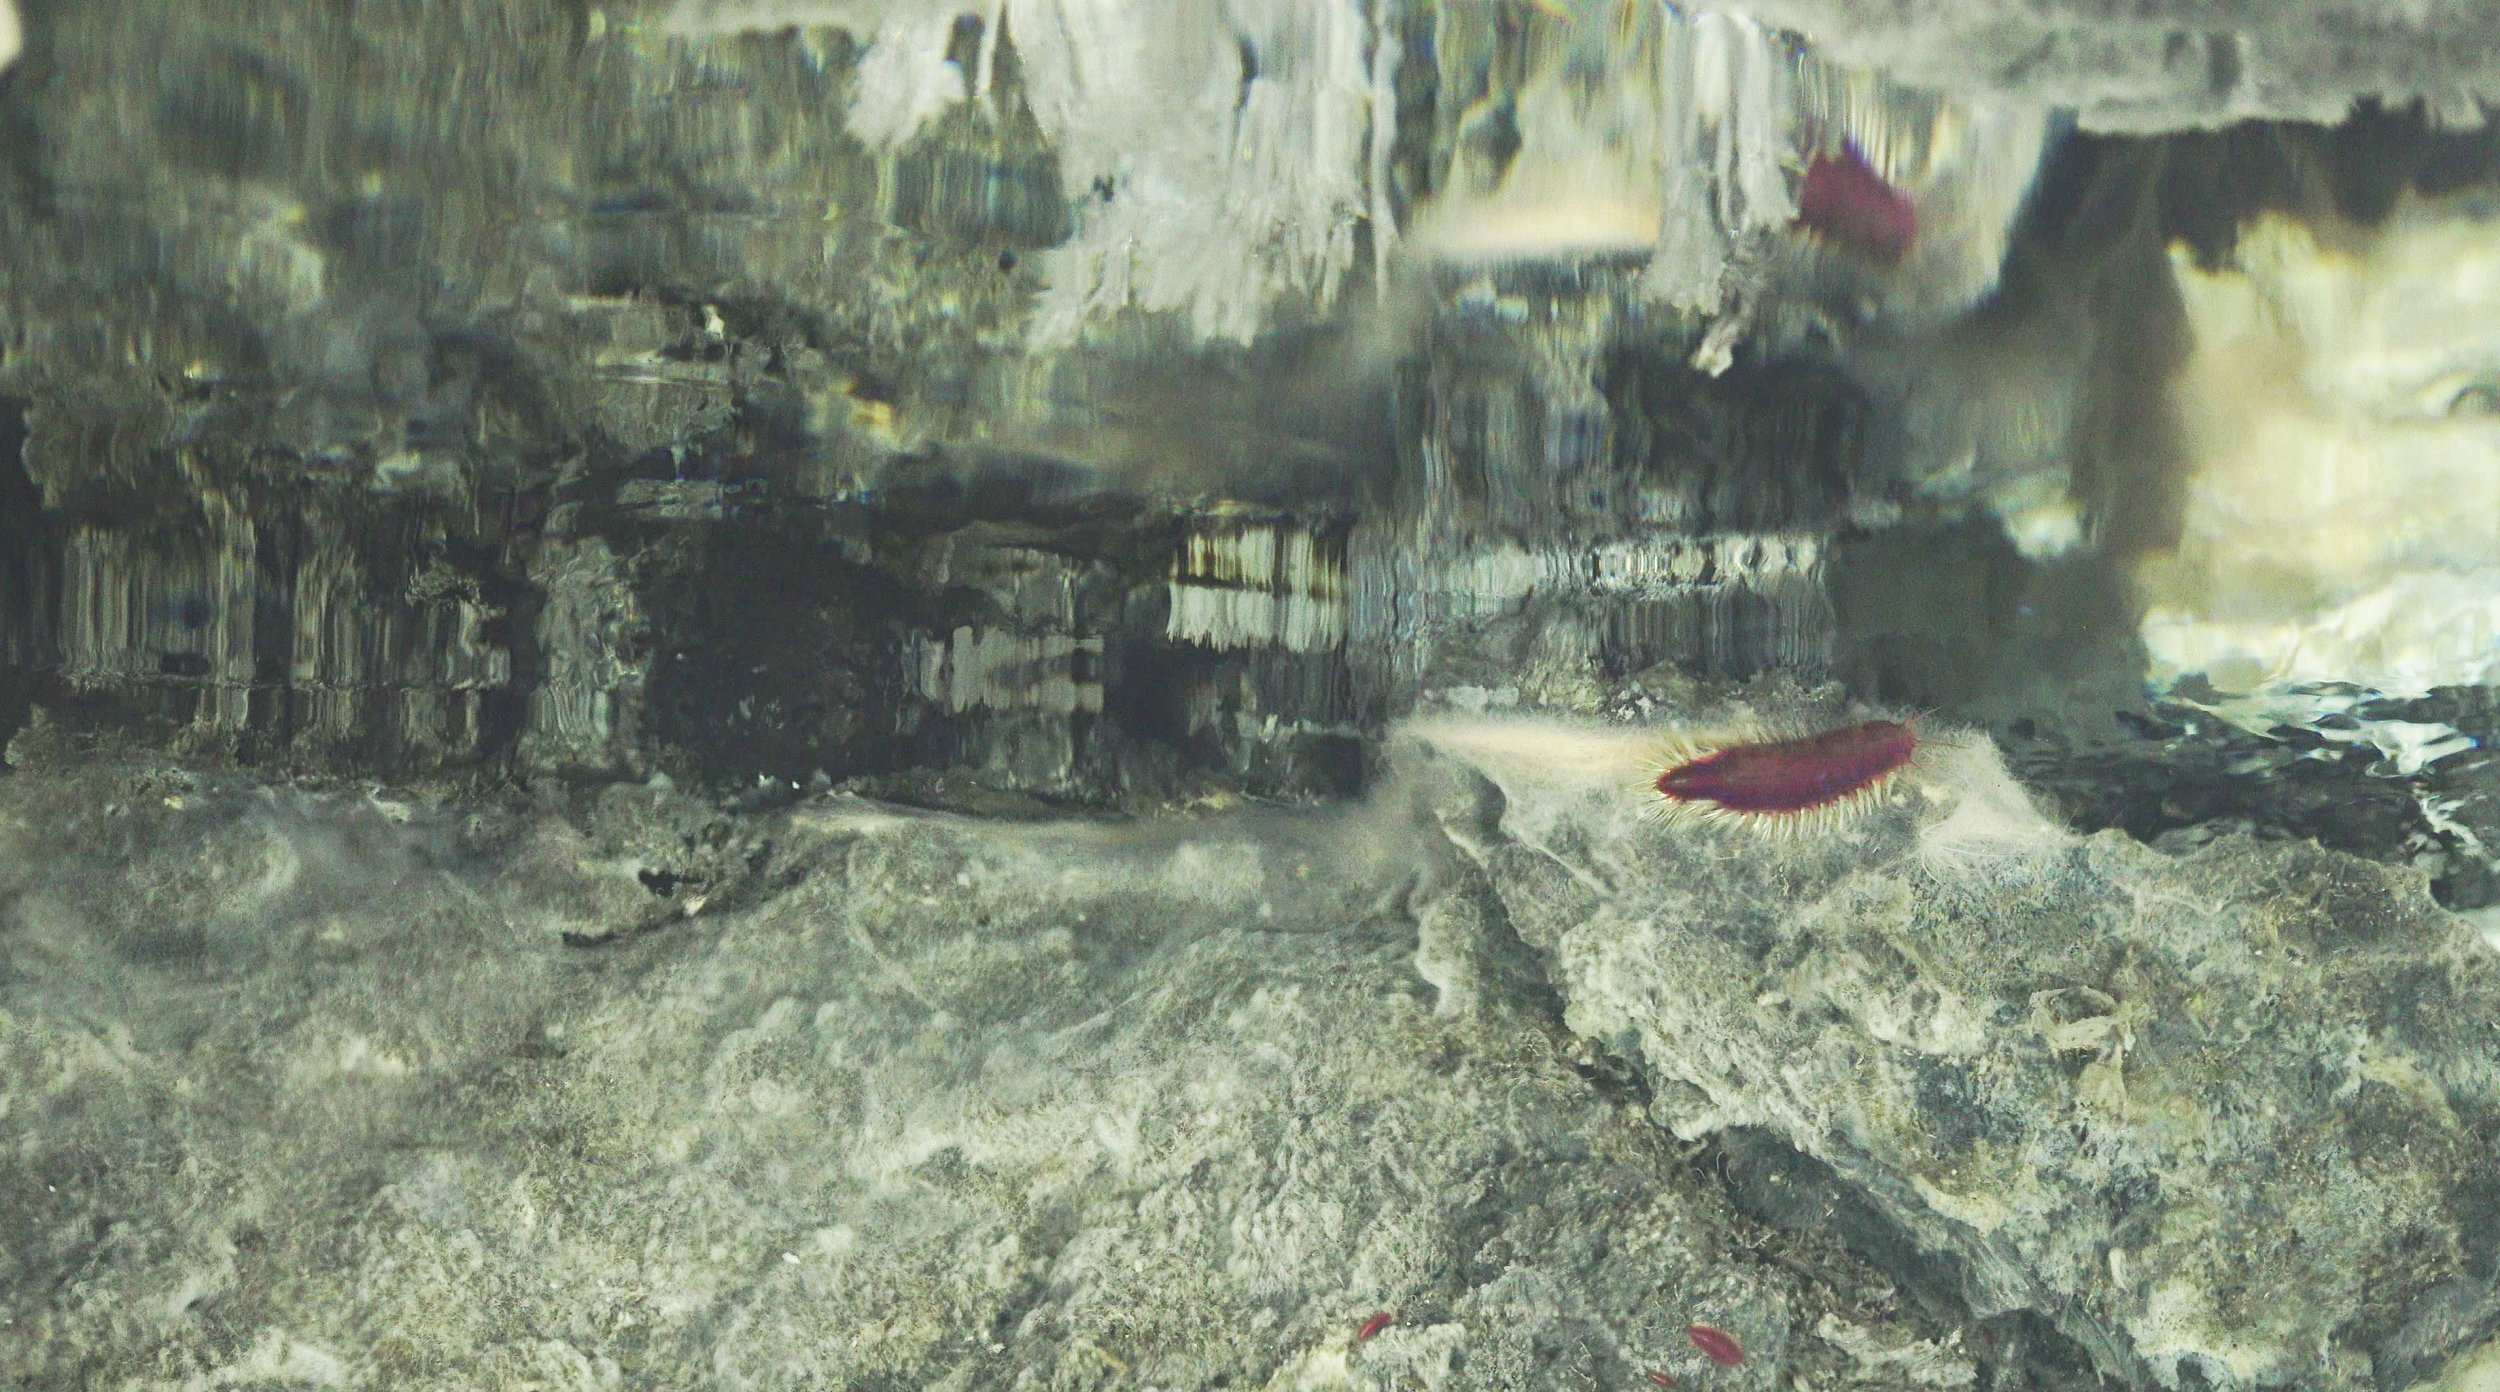 mirror, hydrothermal fluid